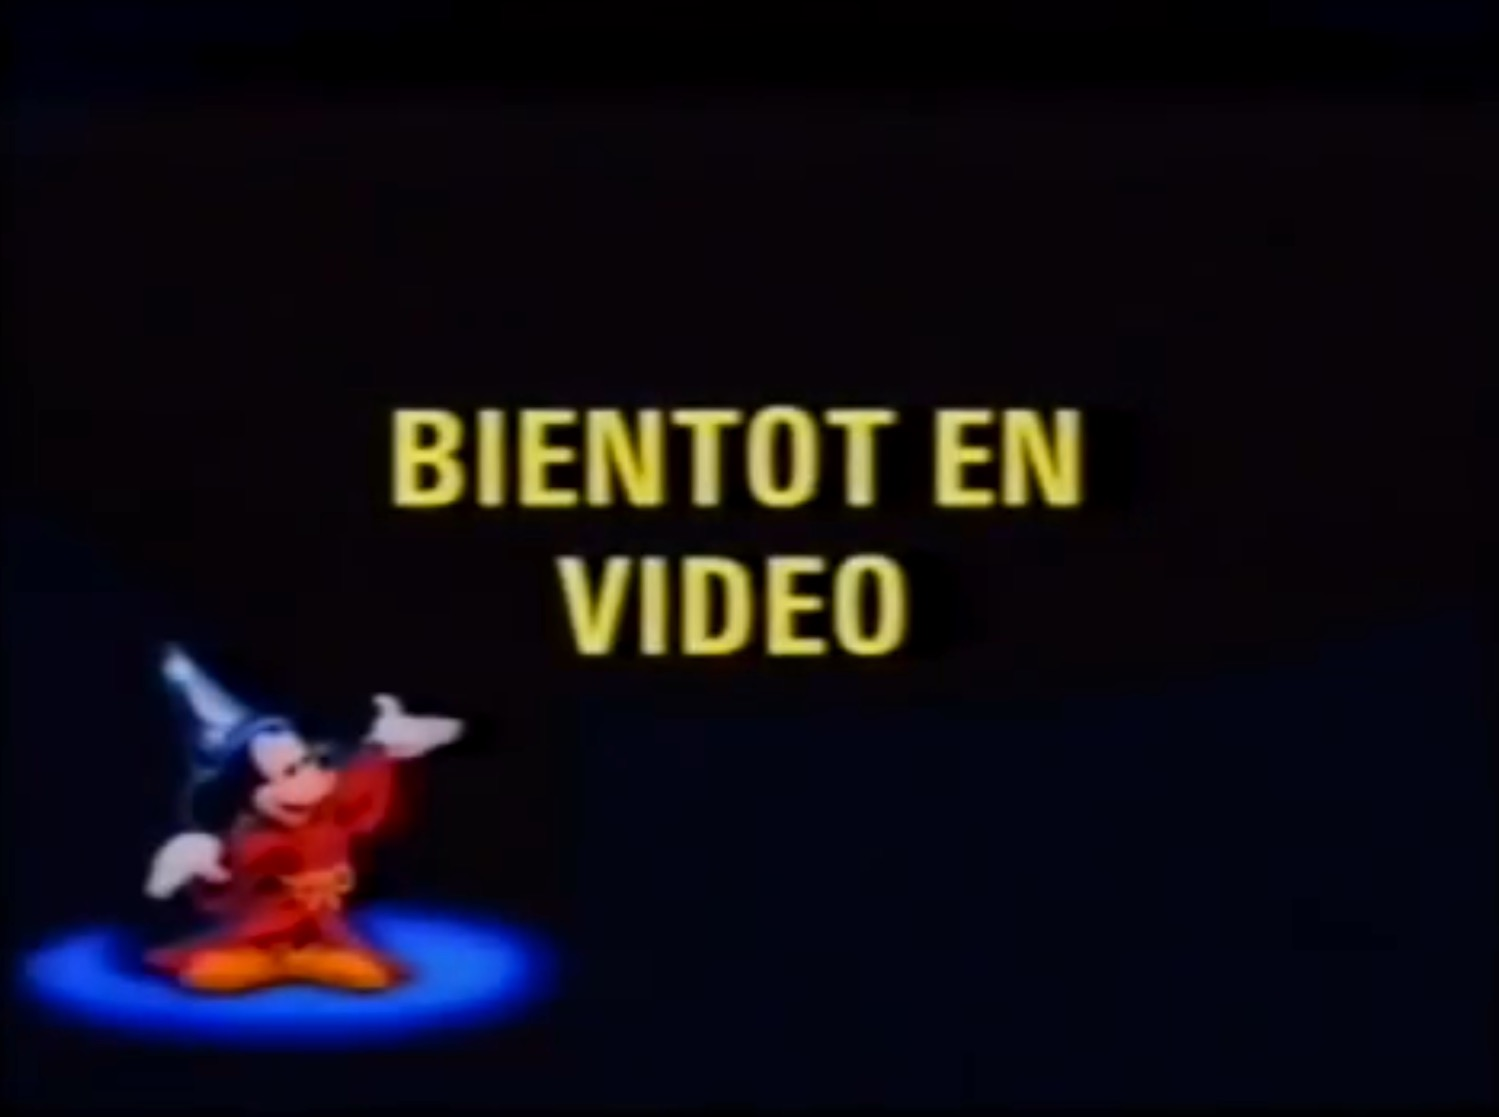 WaltDisneyHomeVideo-BientotenVideo